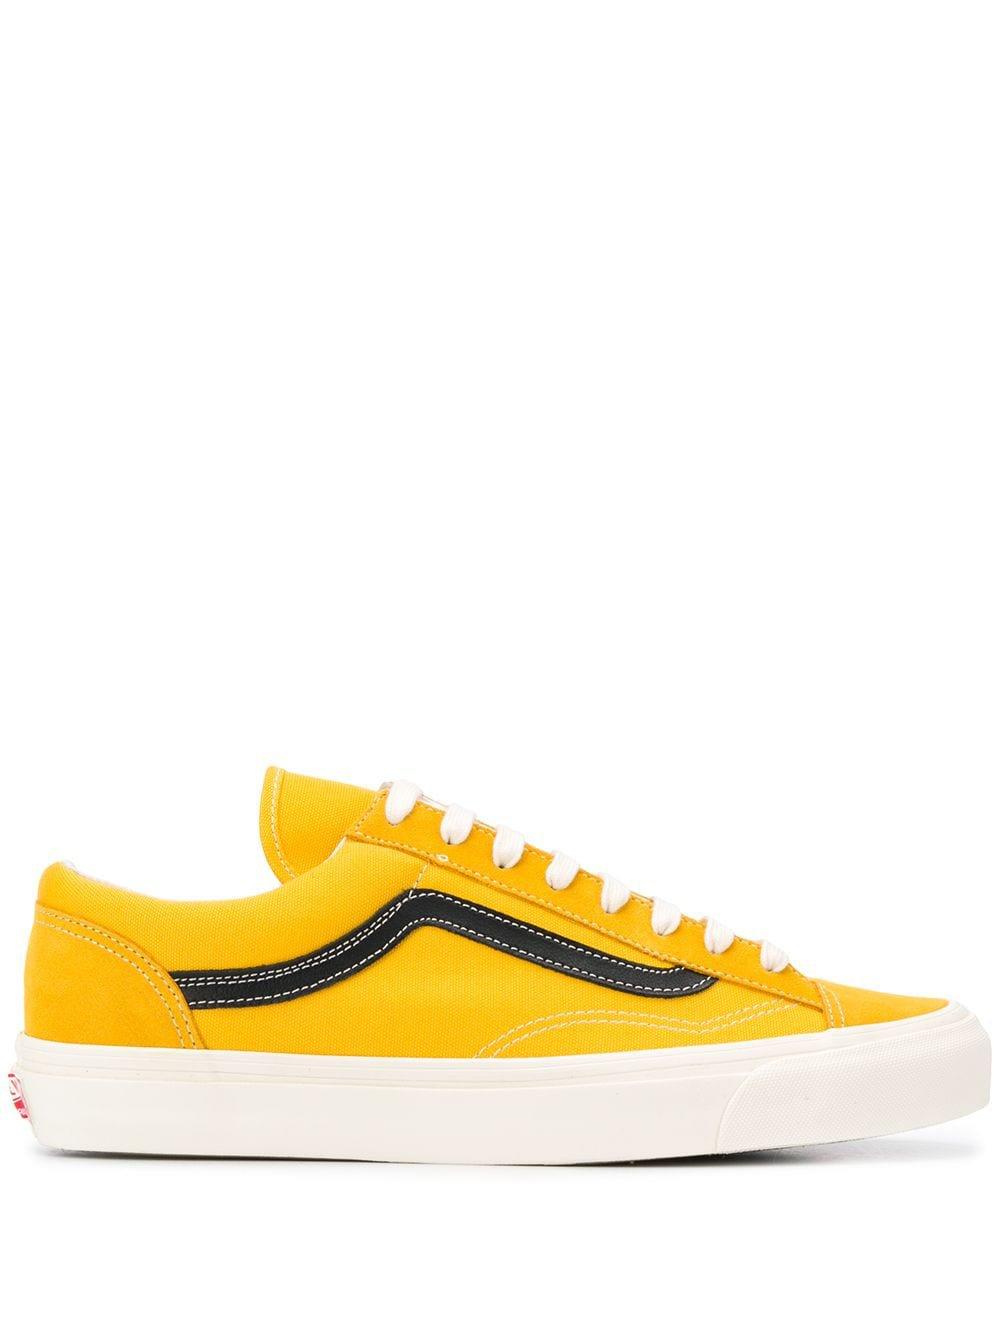 Vans Flat Lace-Up Sneakers